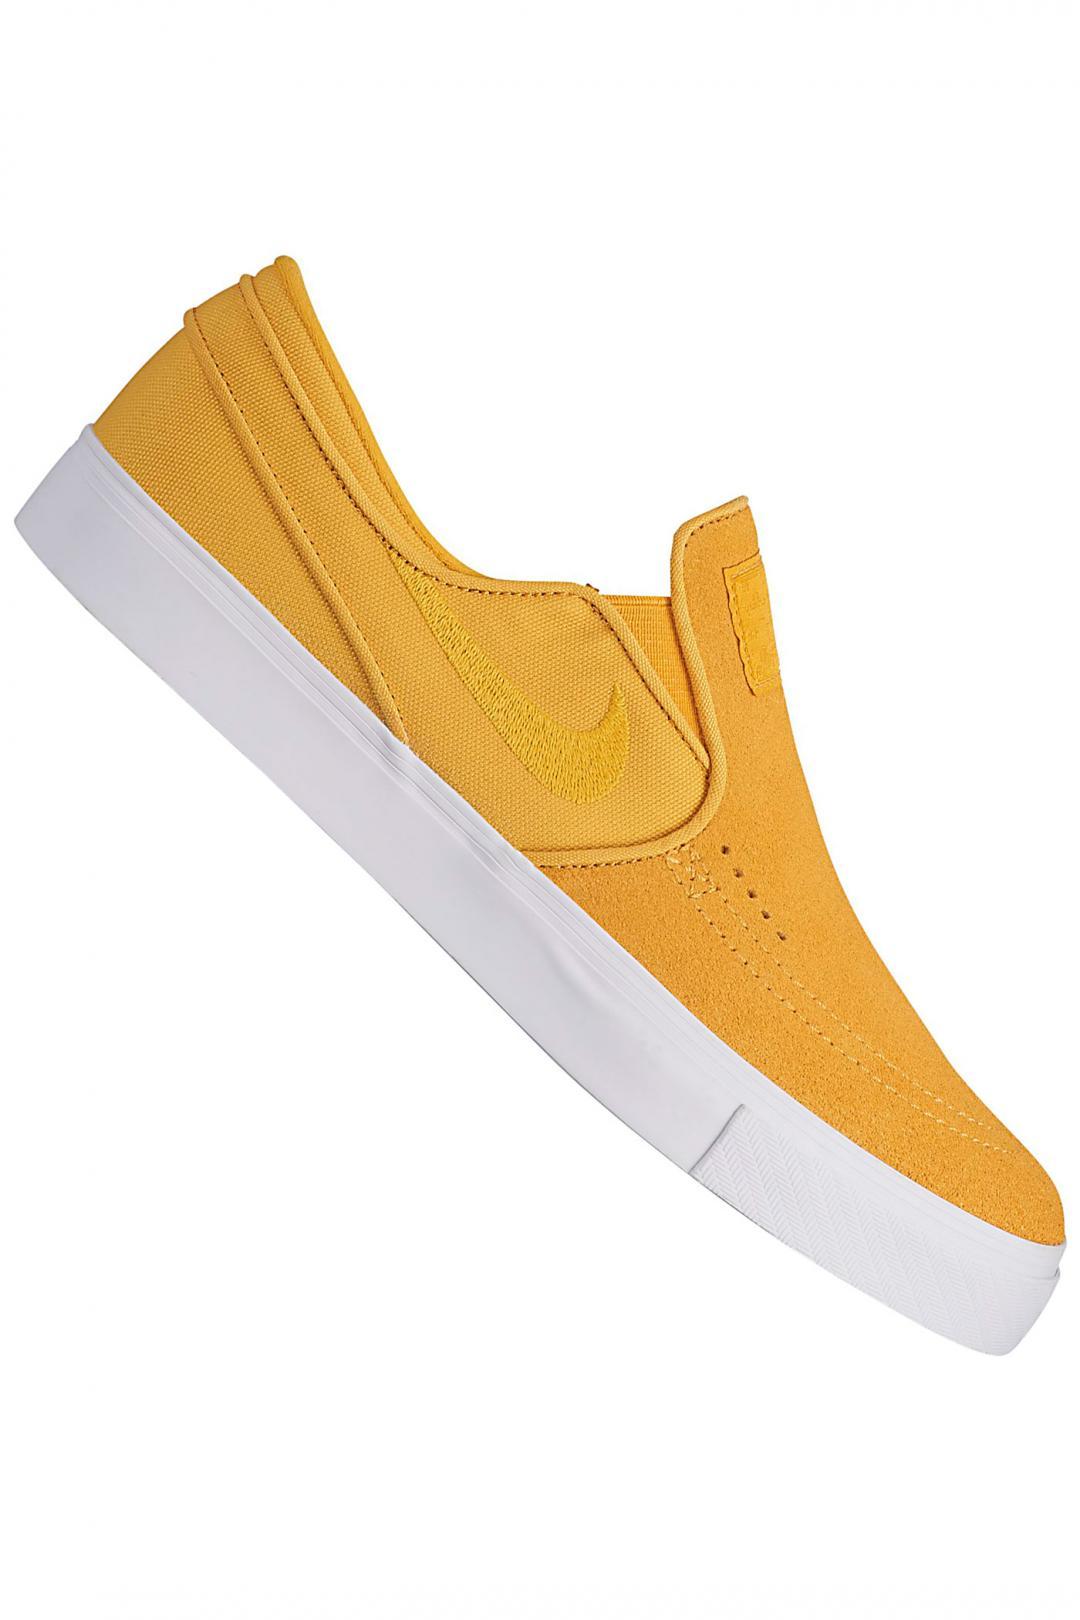 Uomo Nike SB Zoom Stefan Janoski Slip yellow ochre | Scarpe da skate